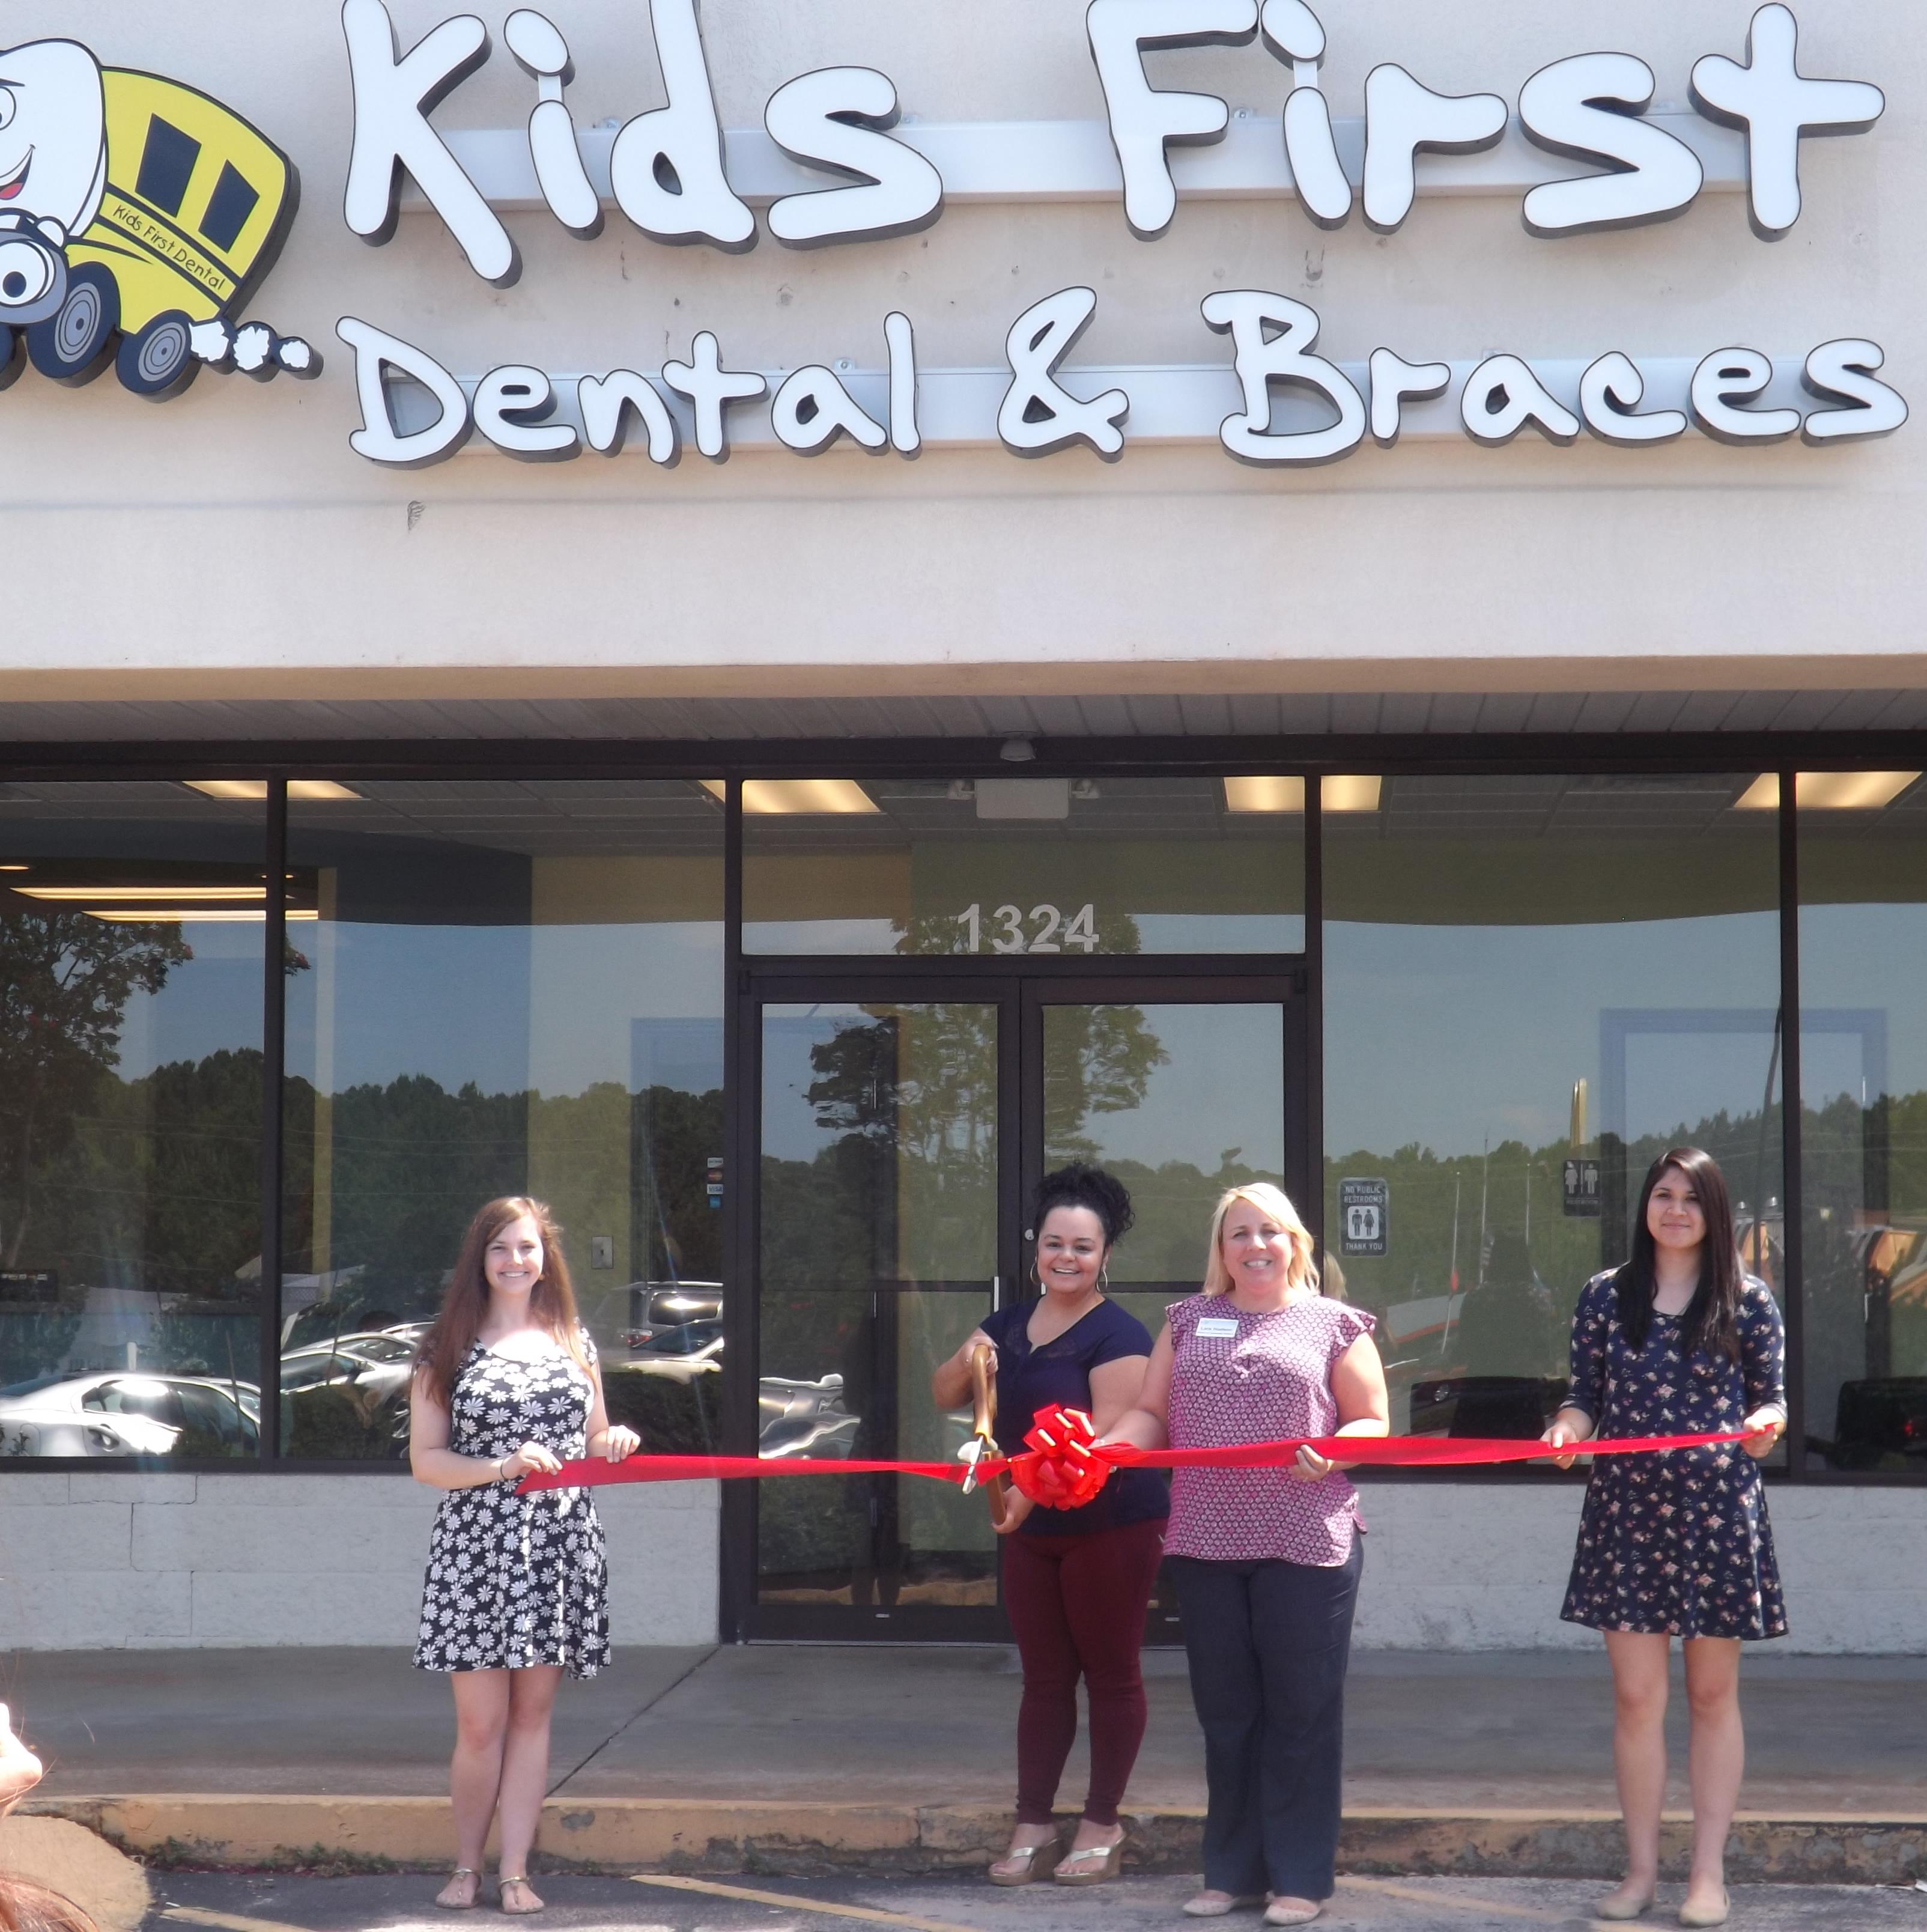 Kids First Dental